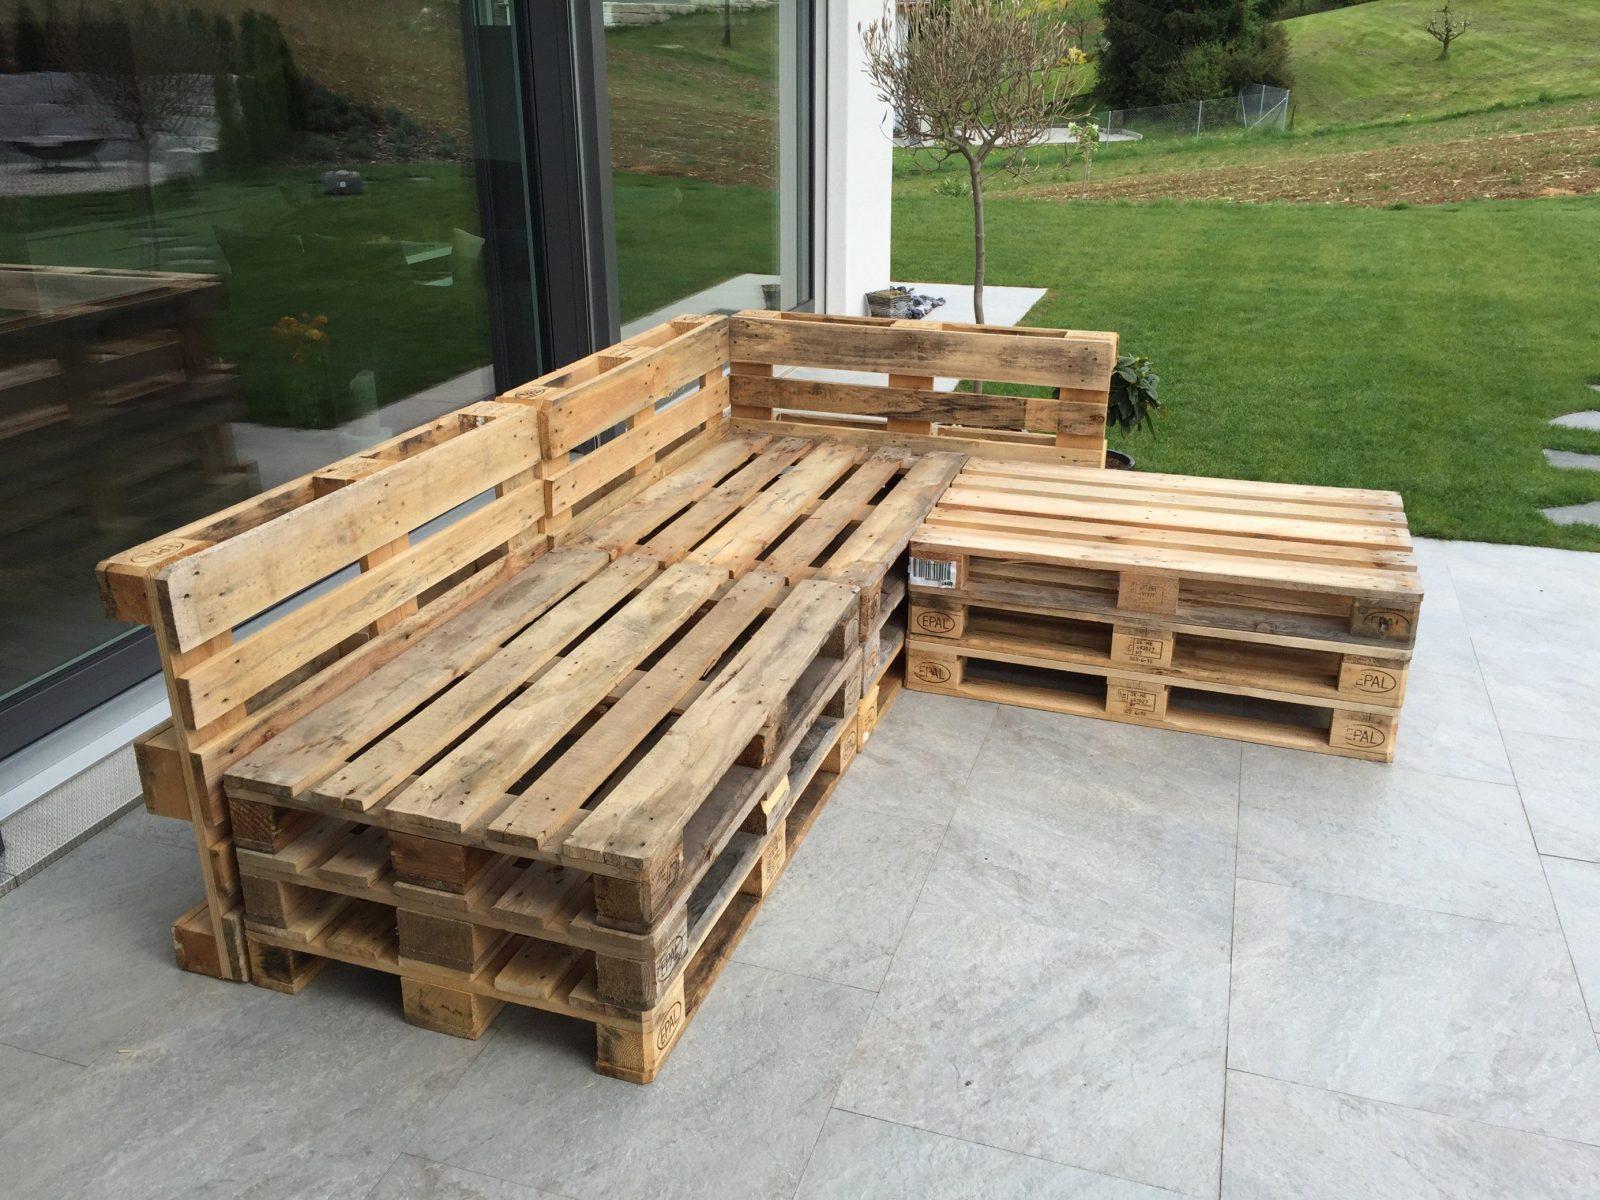 Gartenmöbel Selber Bauen Lounge Ba74 – Hitoiro von Lounge Möbel Garten Selber Bauen Bild